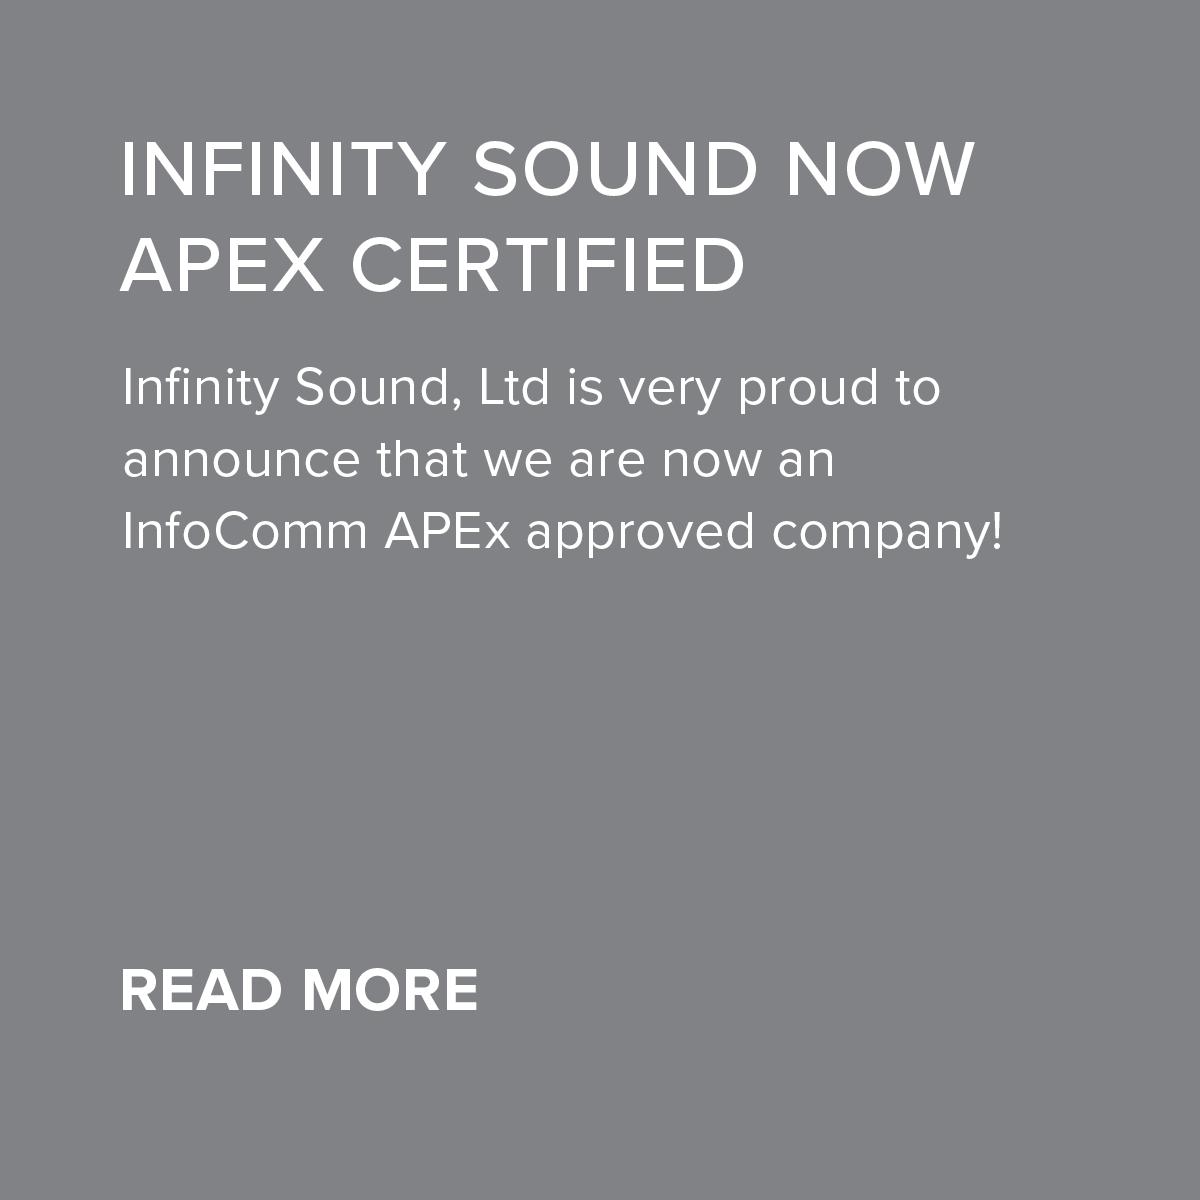 INFINITY SOUND NOW APEX CERTIFIED — Infinity Sound